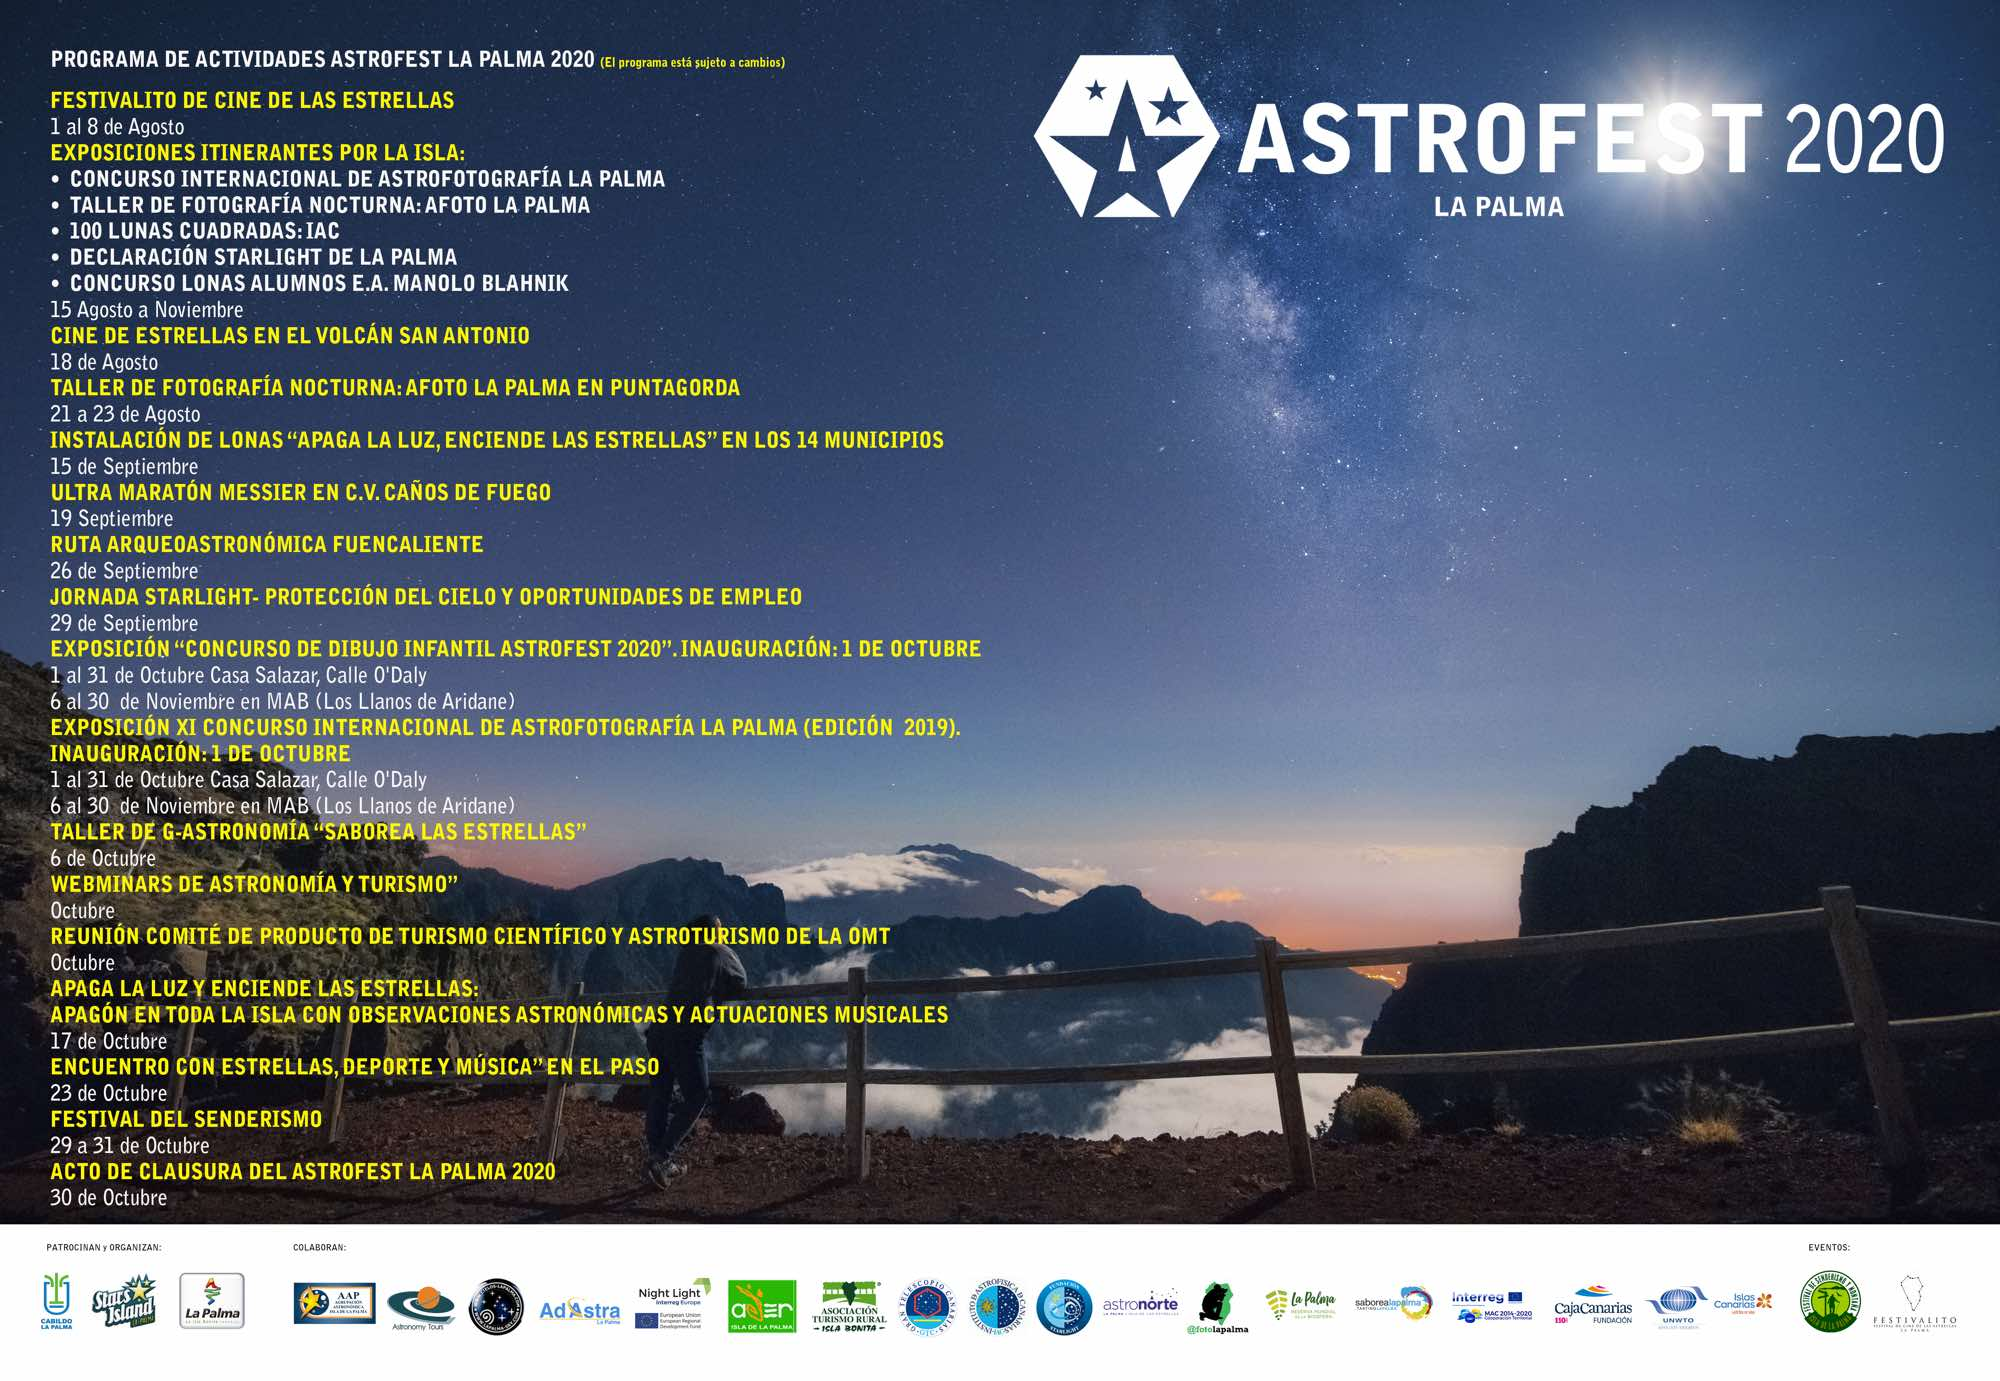 Astrofest 2020 Isla La Palma Programa Cartel